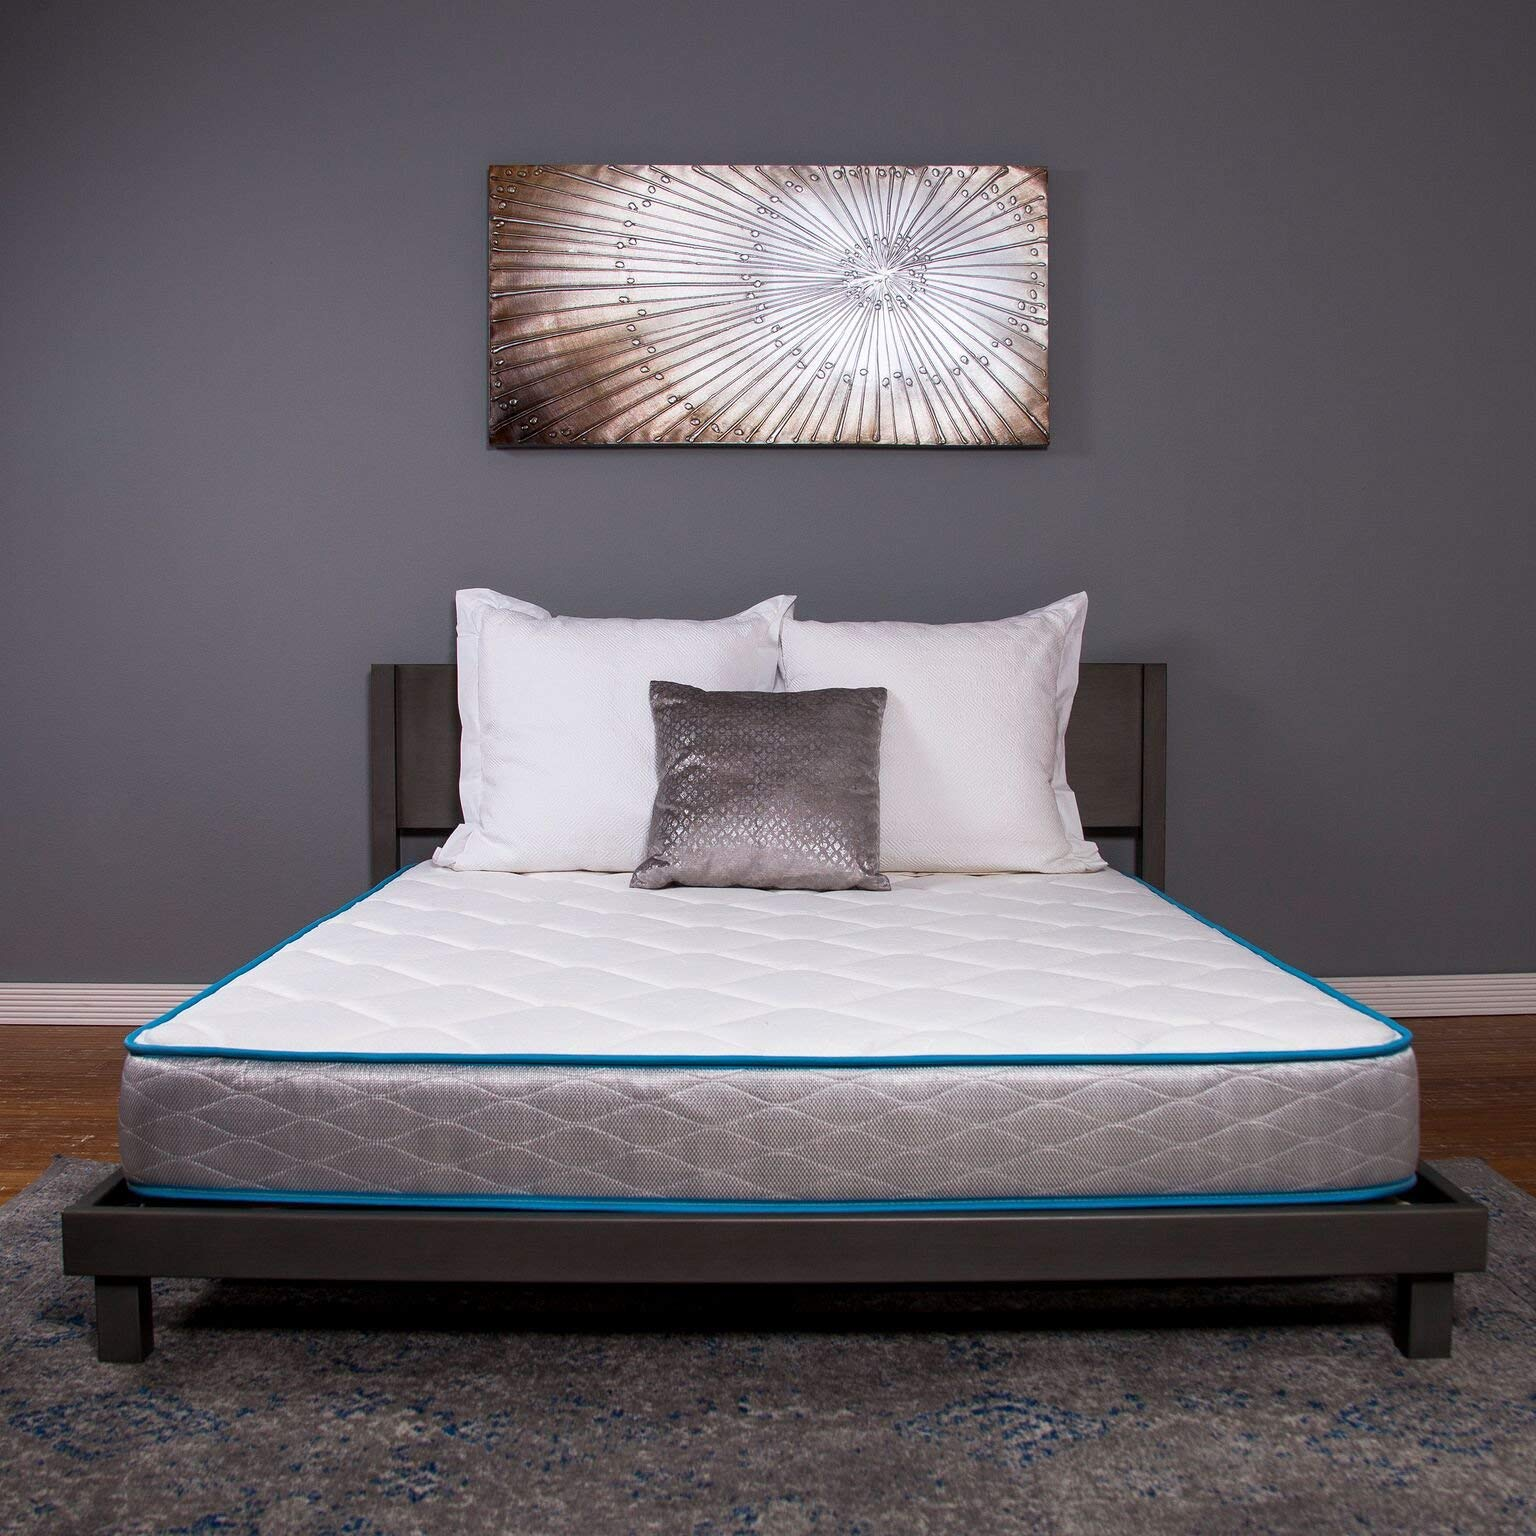 Dreamfoam Bedding Doze 7'' Mattress-Medium Comfort, Twin- Made in the USA